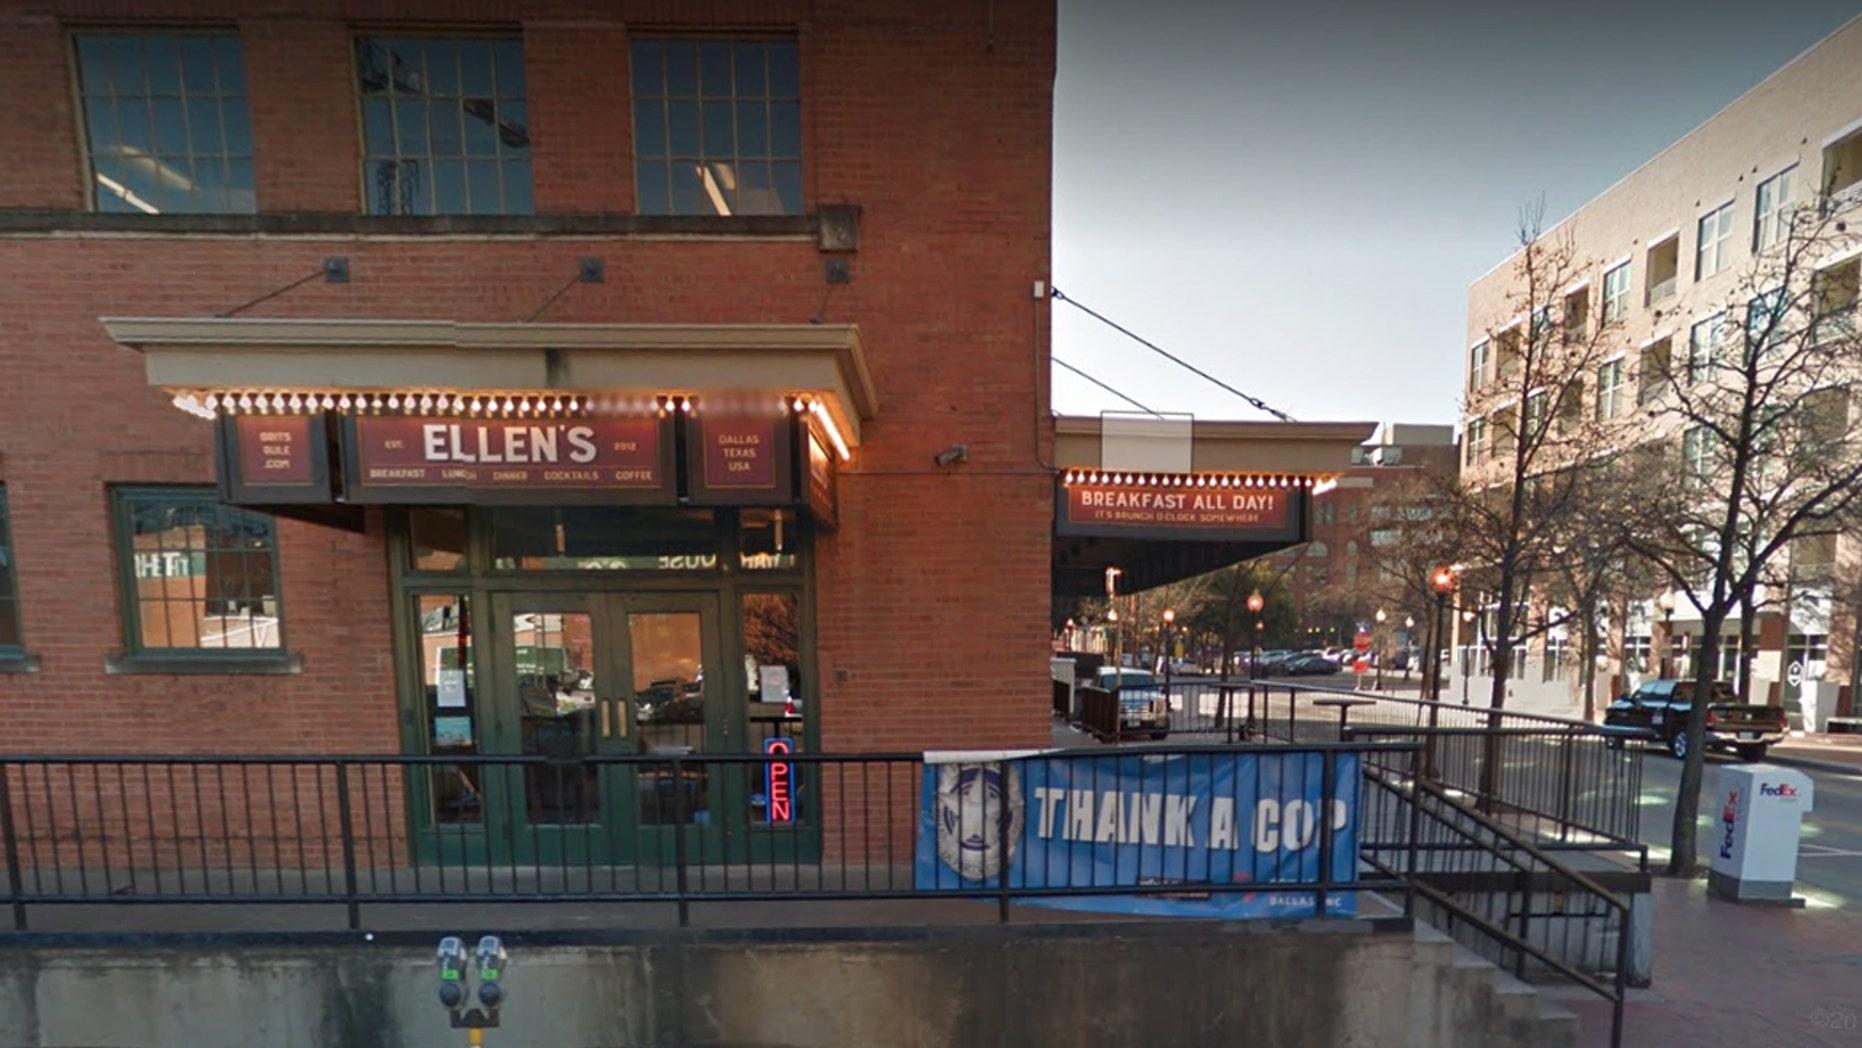 A Dallas restaurant boycotted by the NRA raised $15,000 for a gun reform organization.